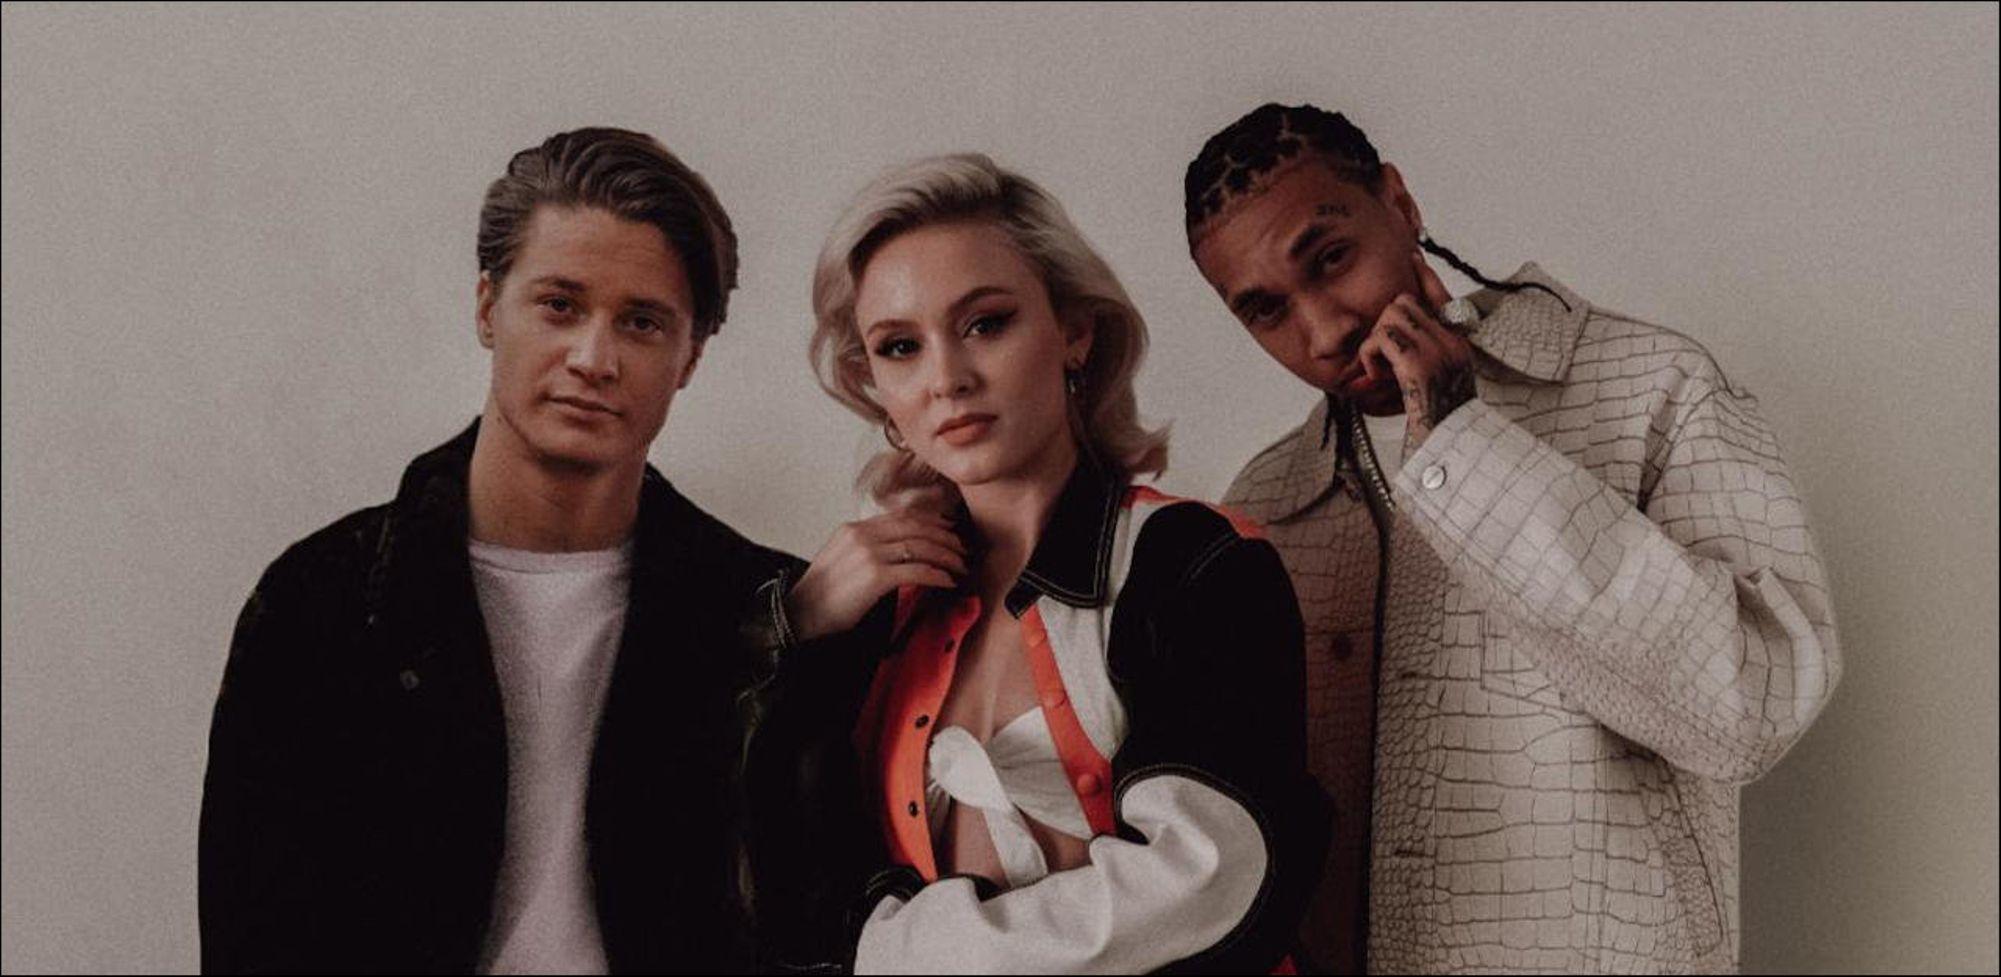 Kygo, Zara Larsson, Tyga「Like It Is」:エレクトロニック・サウンドの波間に漂う歌声_b0078188_18540955.jpg